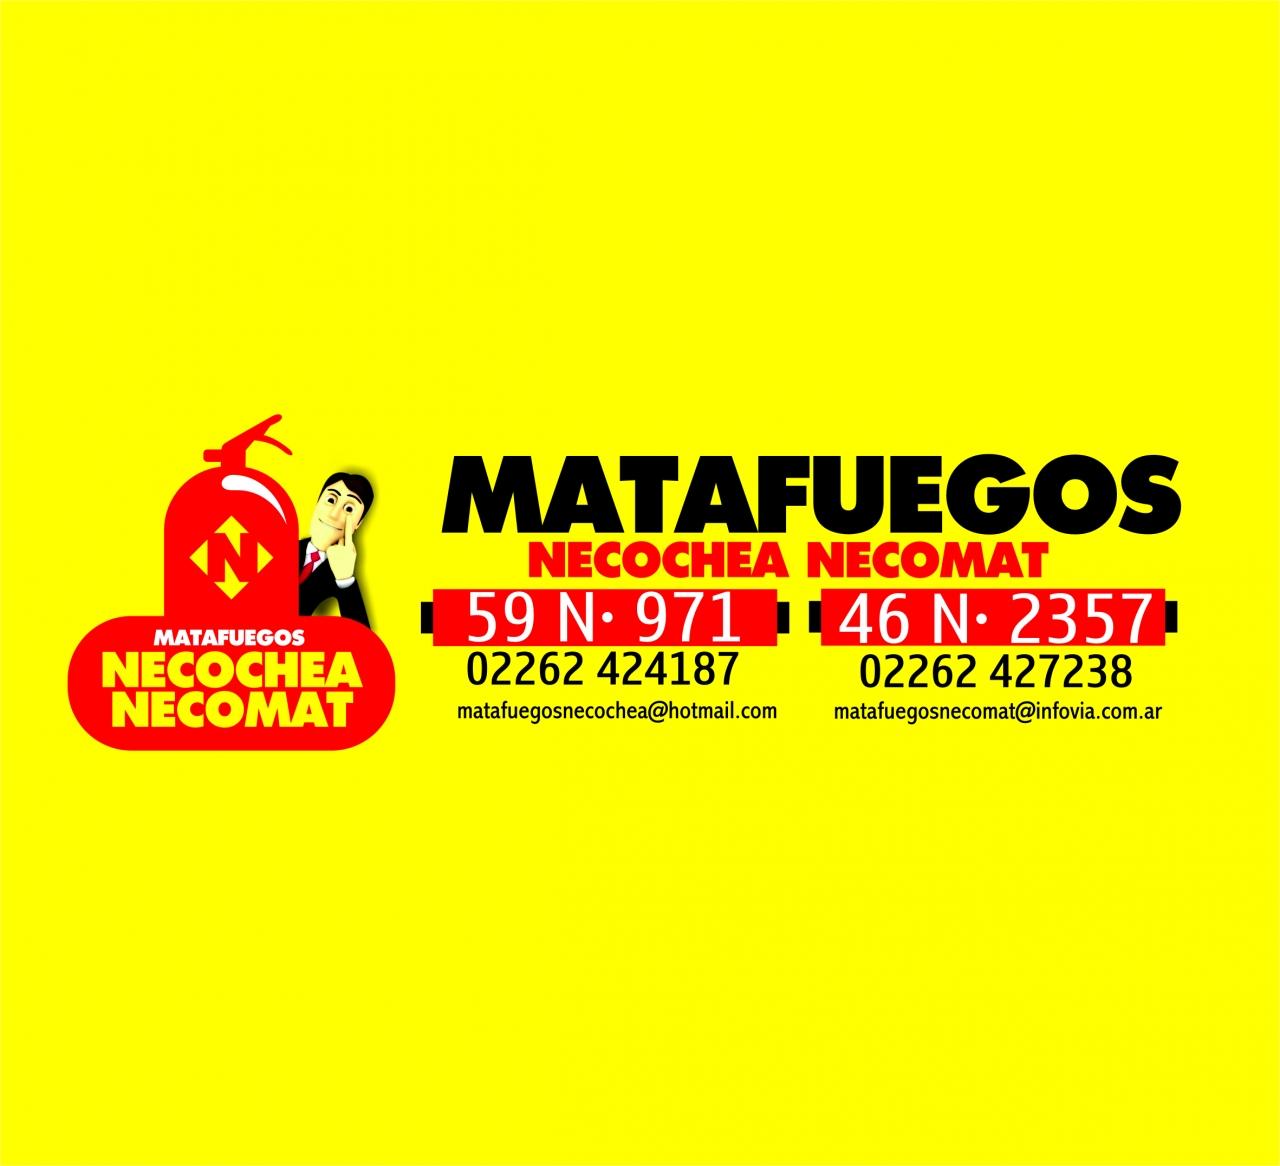 MATAFUEGOS NECOCHEA NECOMAT DRAGO REVISION SEÑALETICA CARTELES SEGURIDAD MANGUERAS INCENDIO O